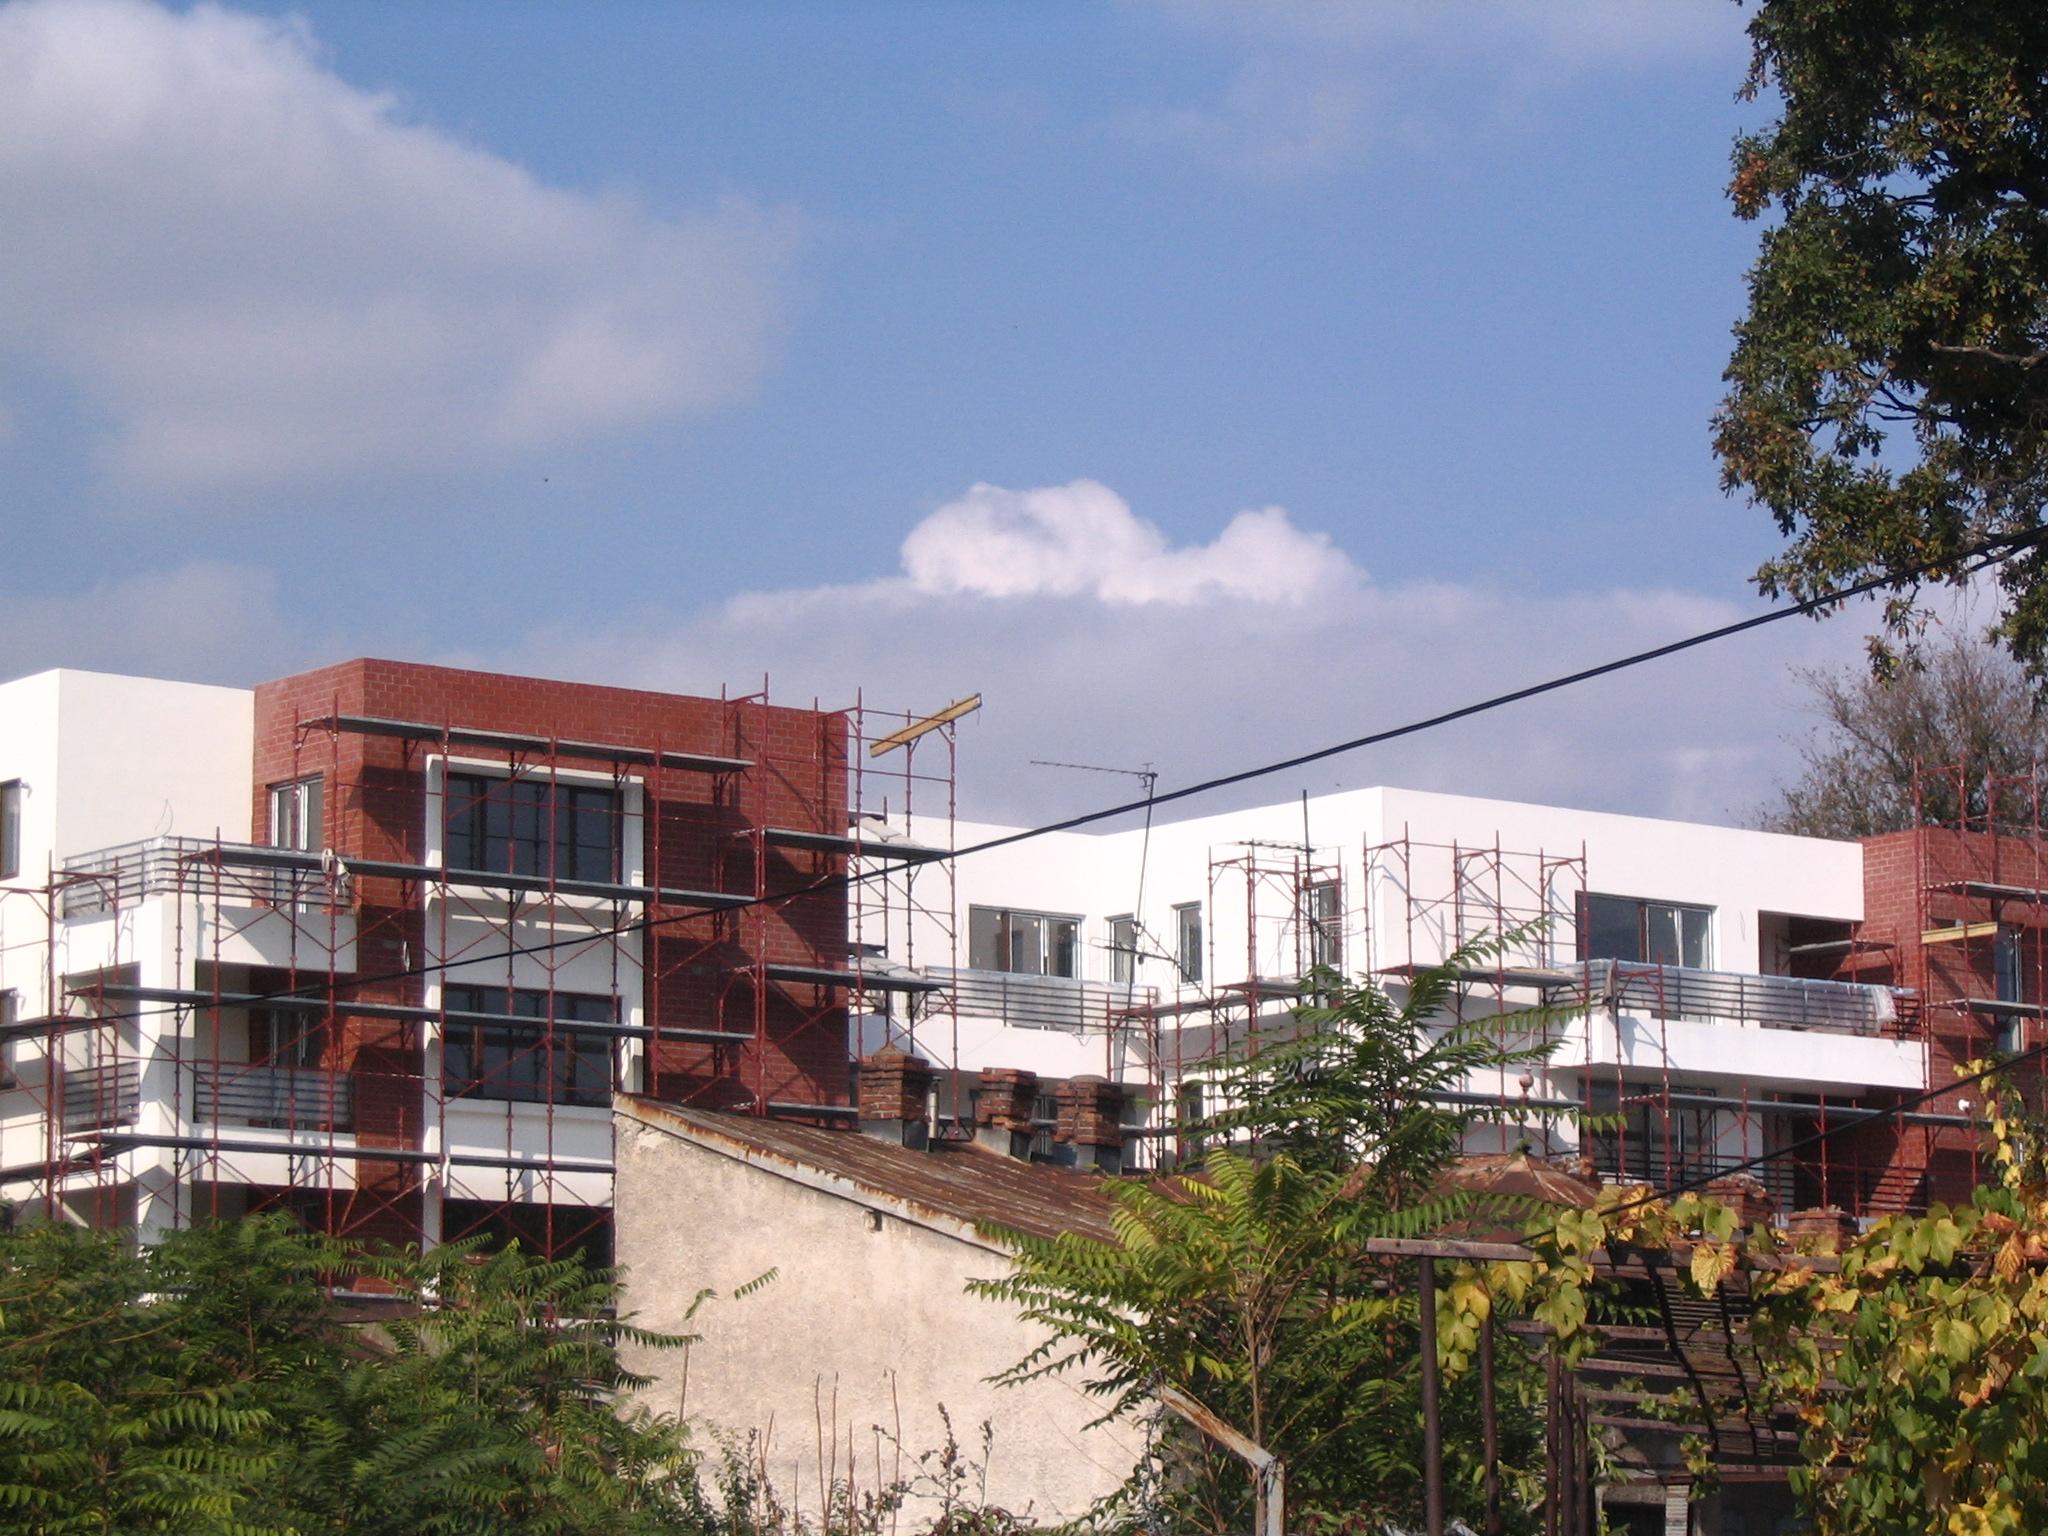 Ansamblu de locuinte in str. Popa Tatu, nr. 60-62, colaborare cu arh. Mihaela Hariton la fazele PAC si DDE  - Poza 2